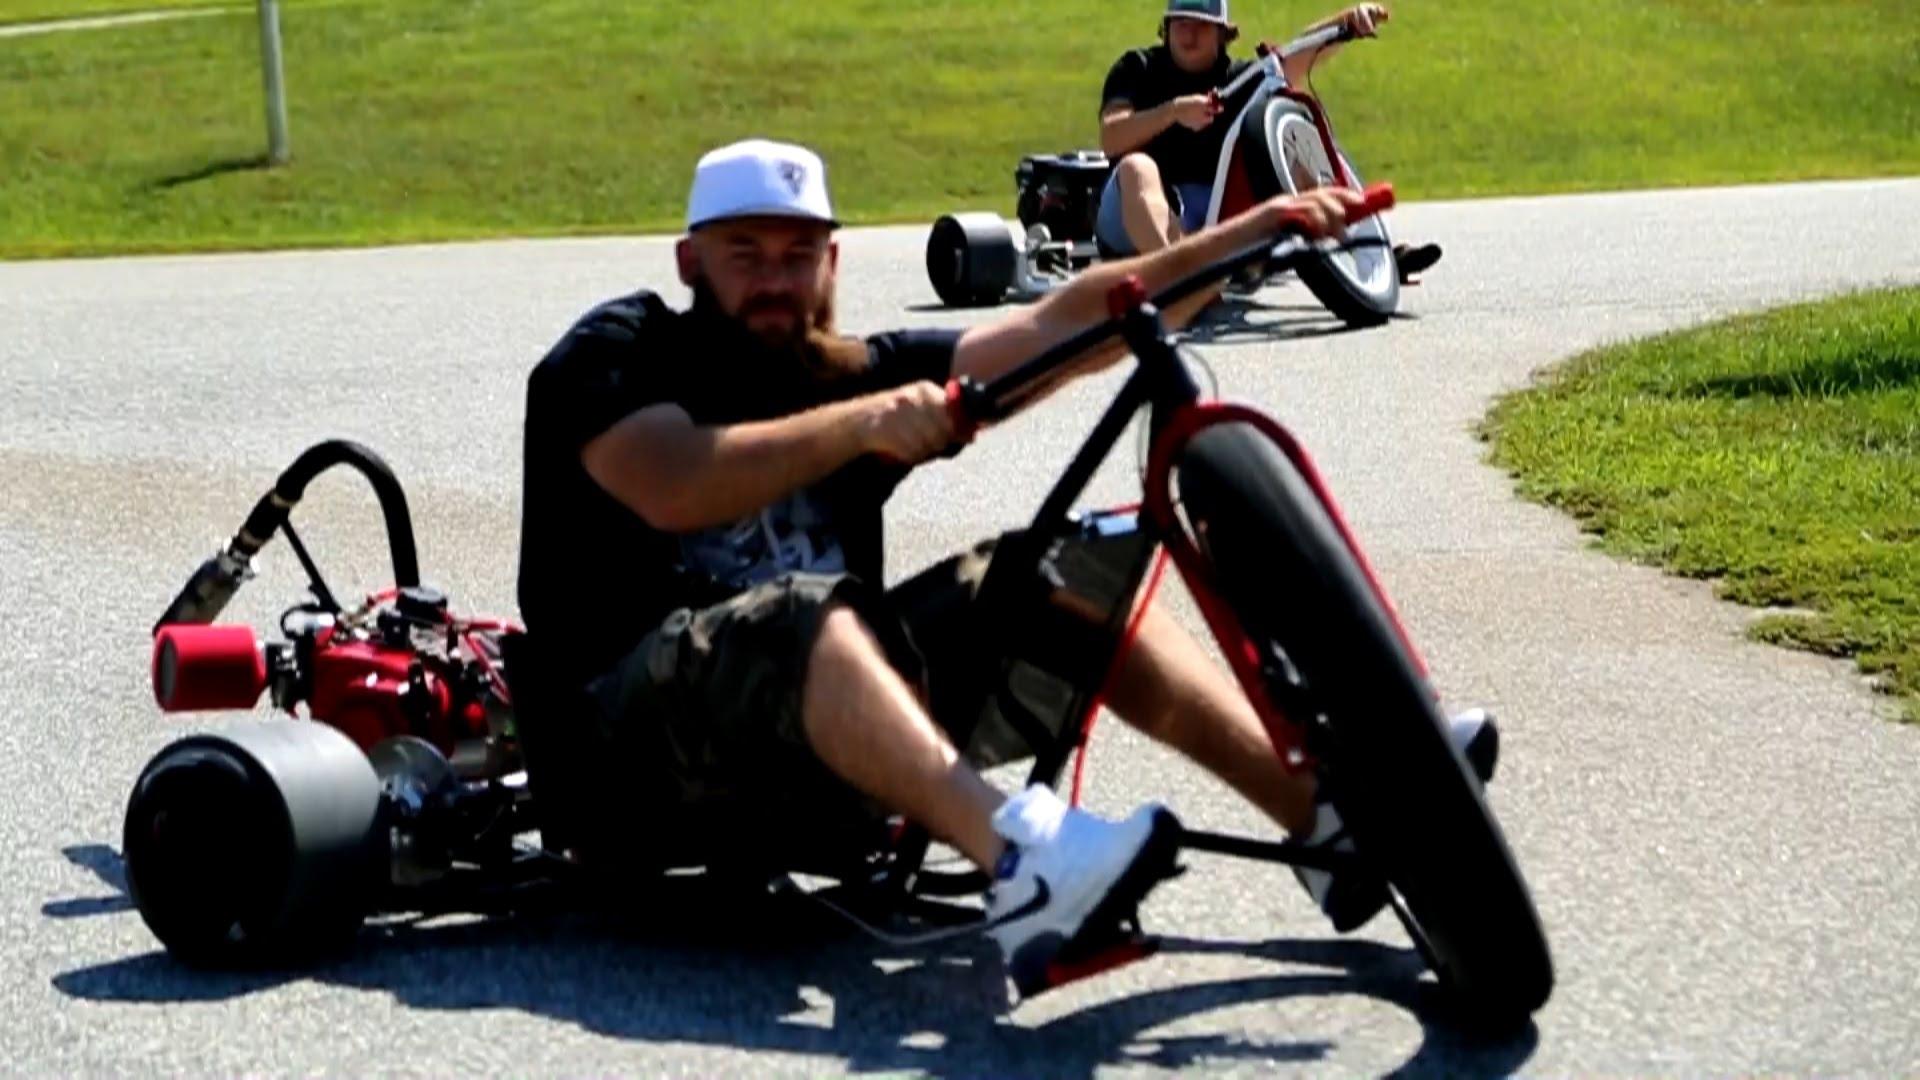 Motorized Drift Trike Is Made Big Boys